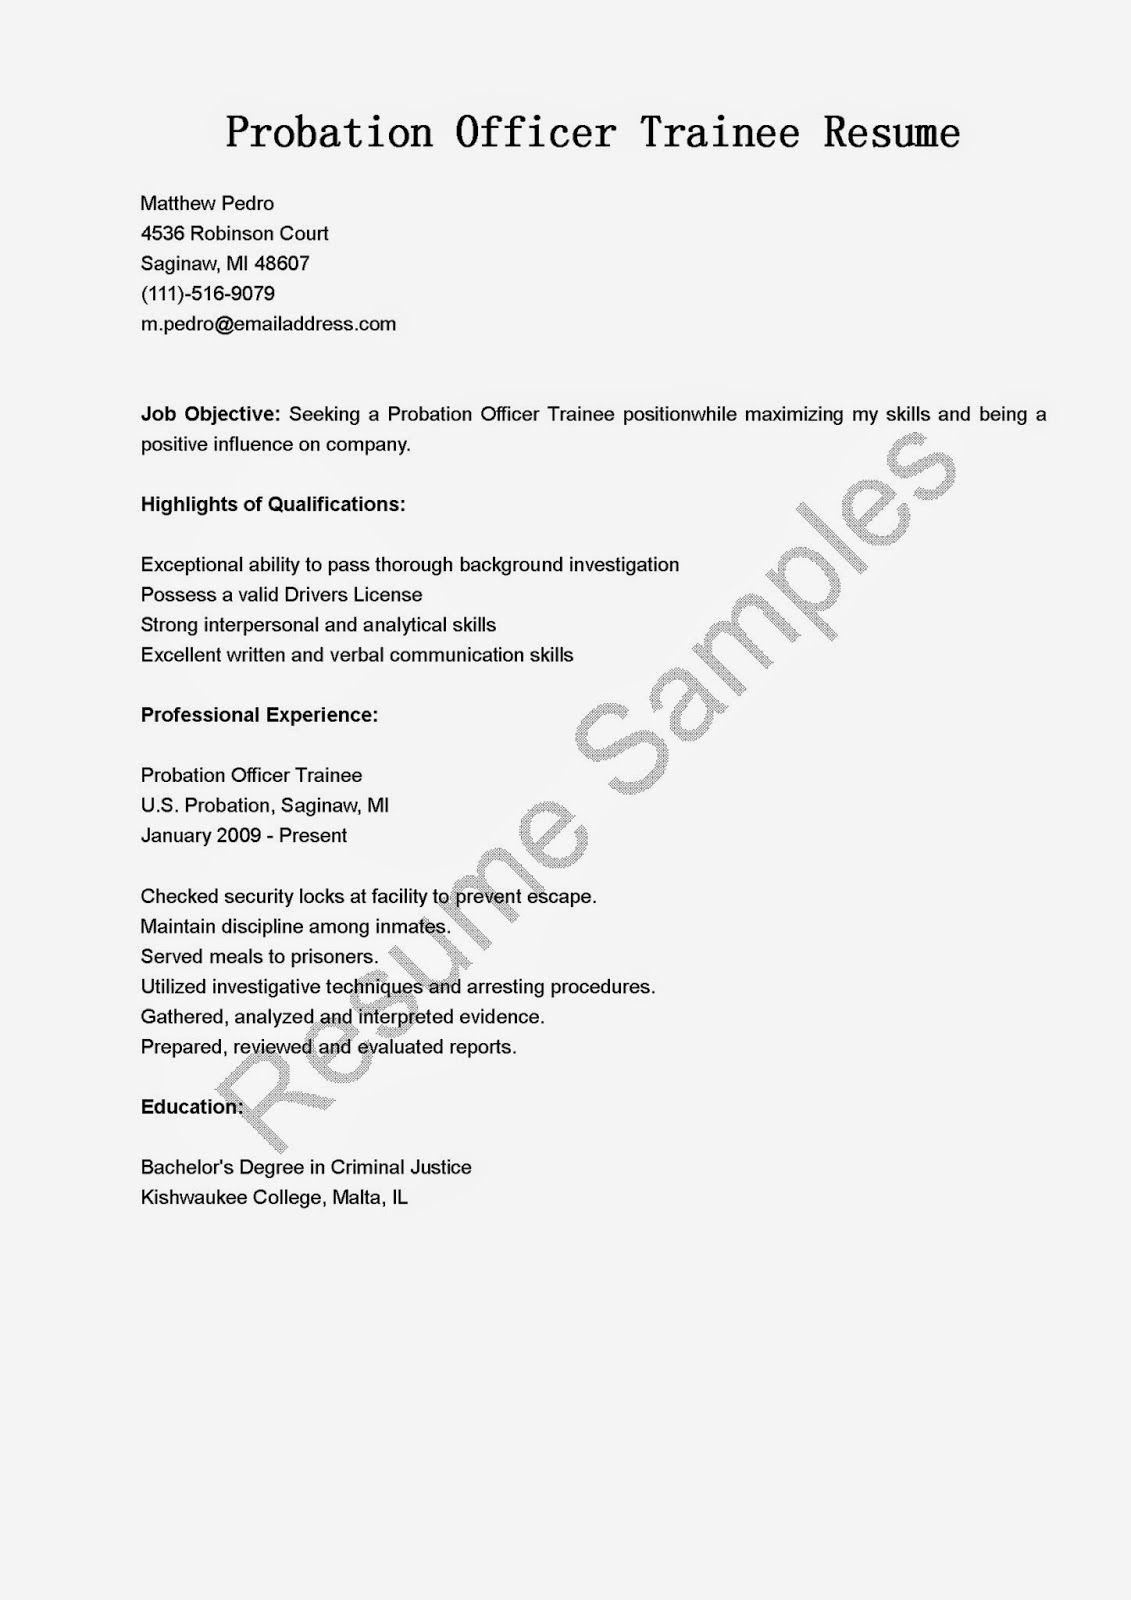 probation officer trainee resume sample